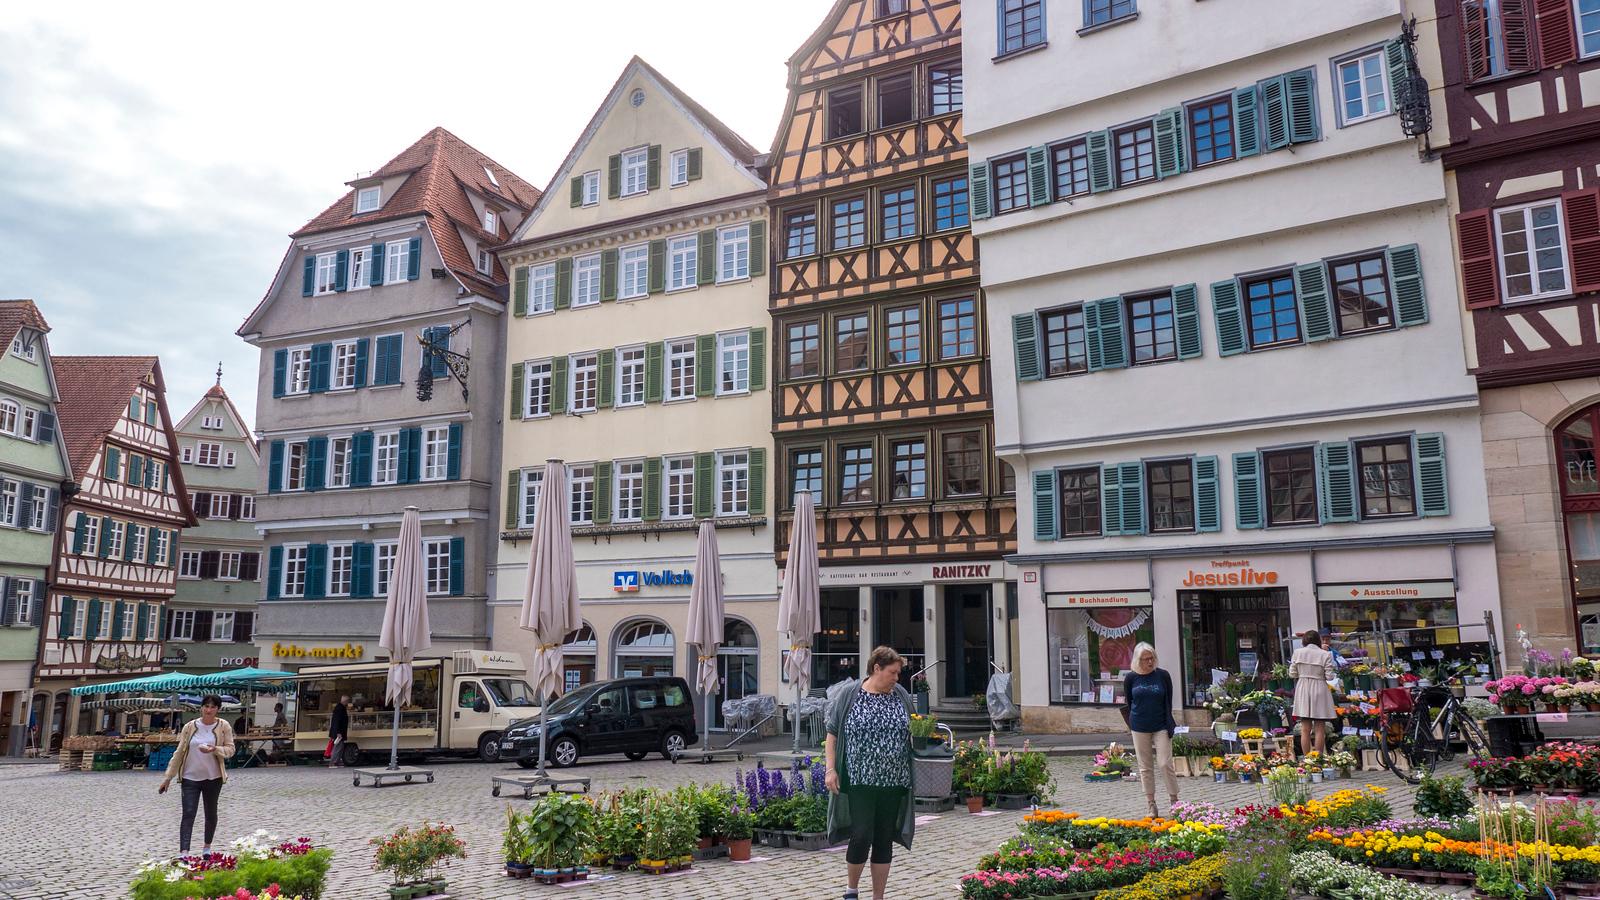 Farmer's market at Market Square in Tubingen. Things to do in Tubingen Germany.